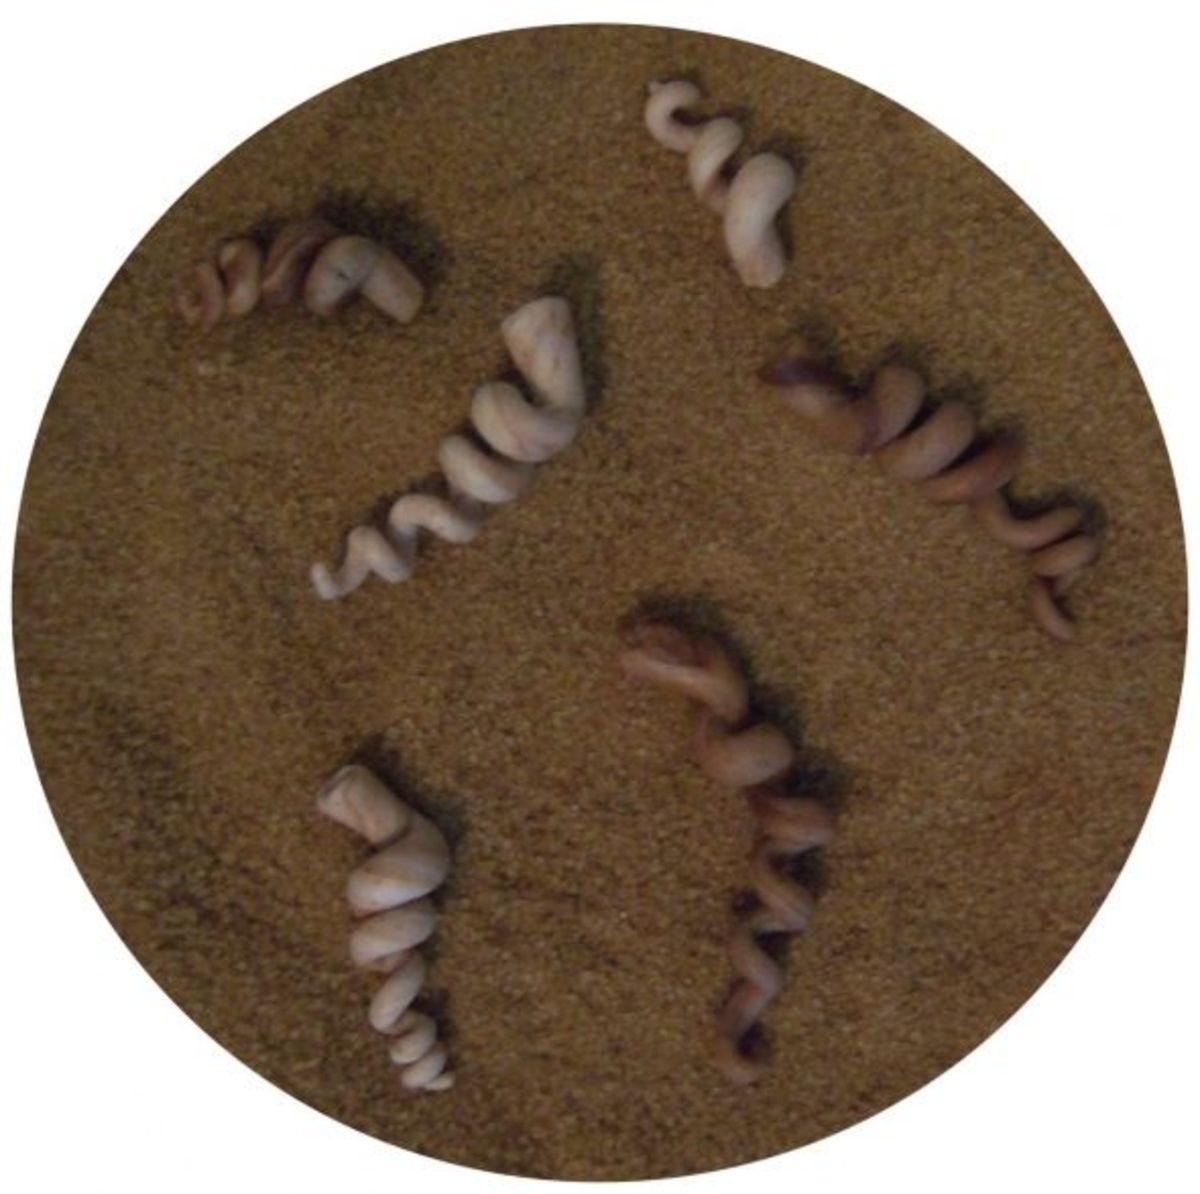 fondant_seashells